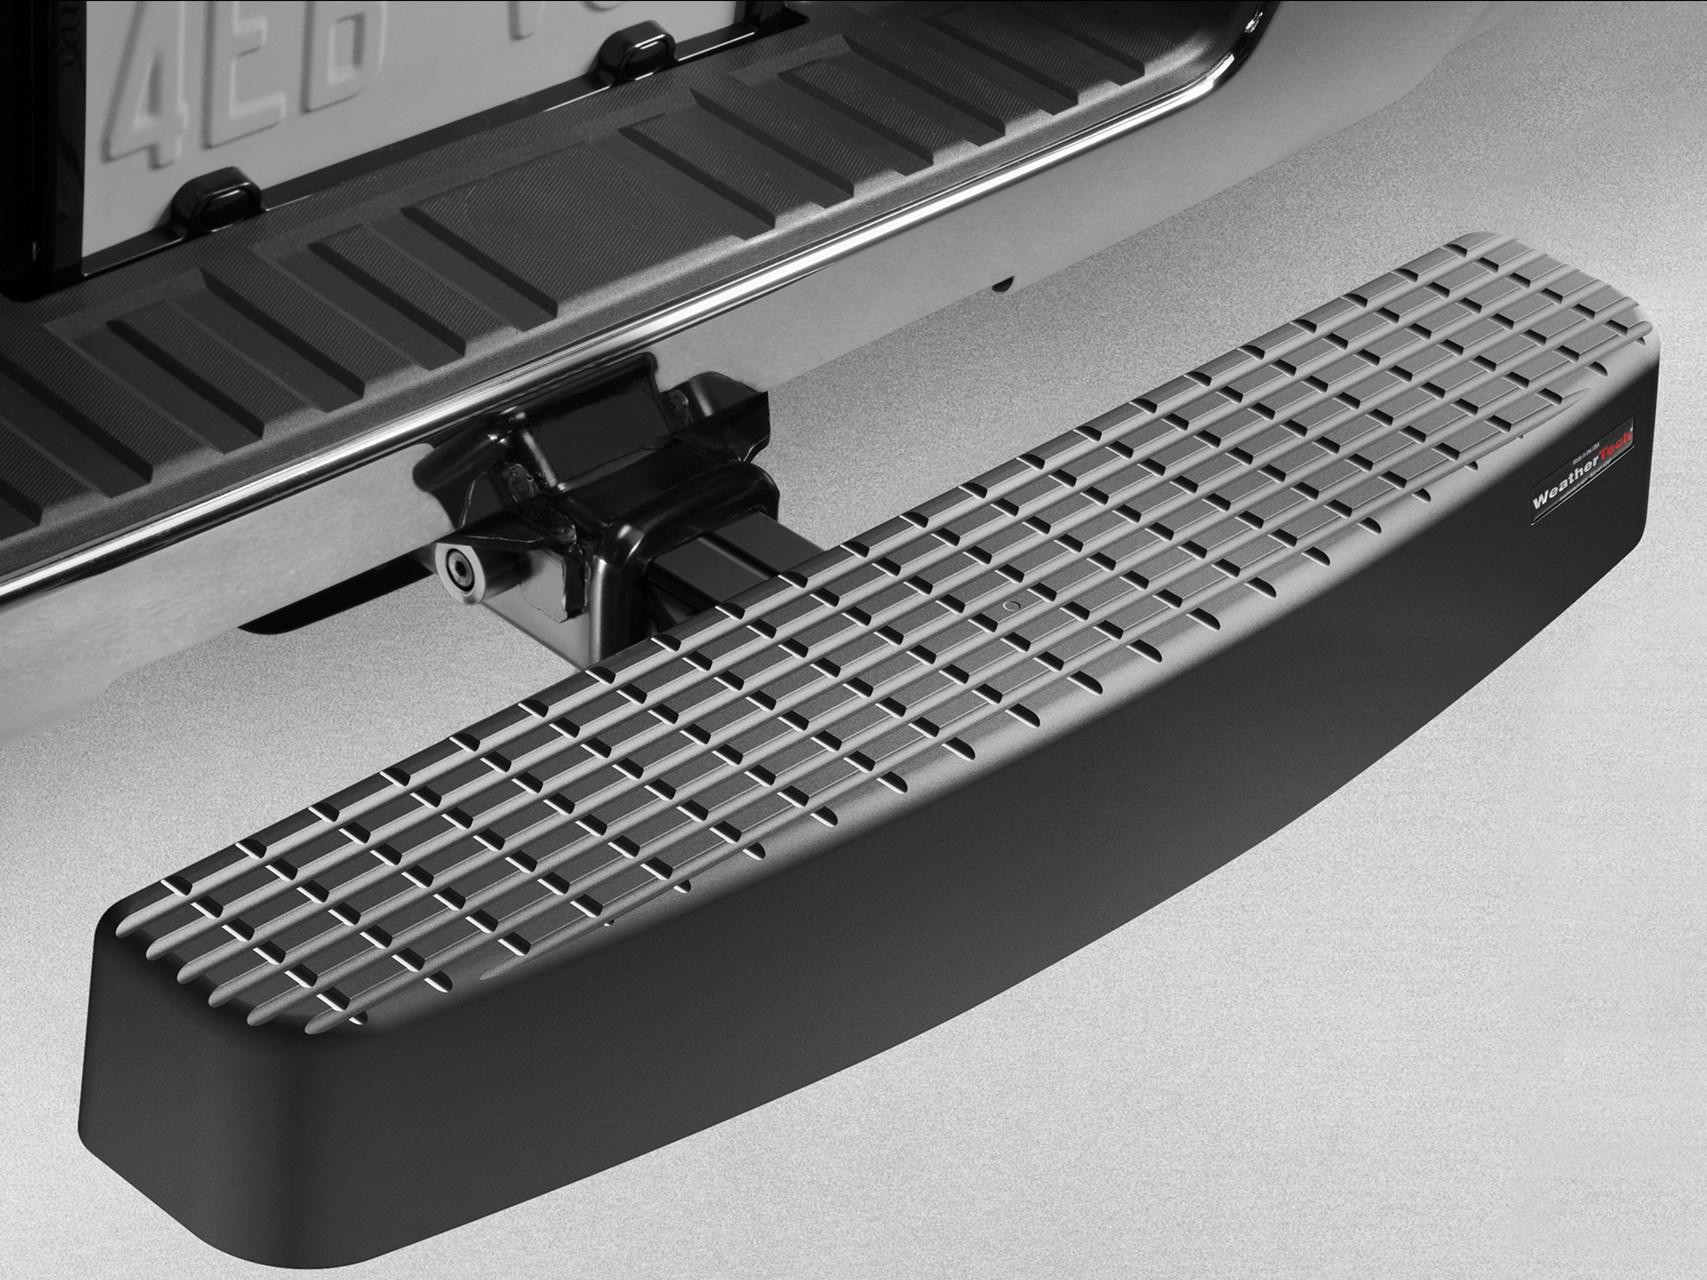 floor mats - laser measured floor mats for a perfect fit